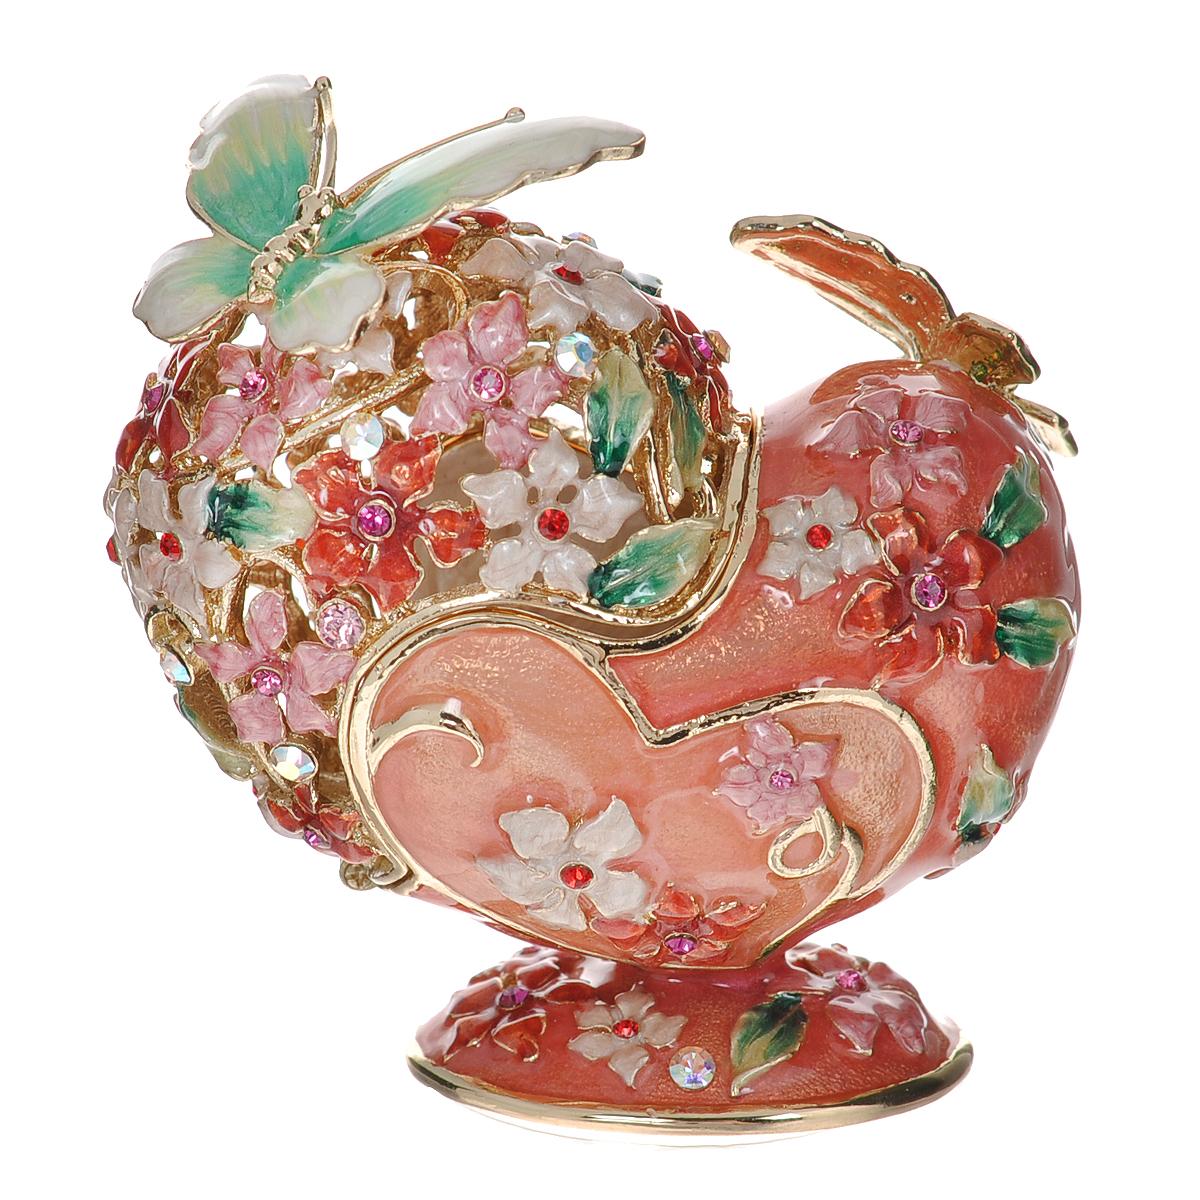 Шкатулка Сердце, цвет: розовый, 6 х 3,5 х 6,5 см 64122 шкатулка для ювелирных украшений win max 20 х 17 х 9 см